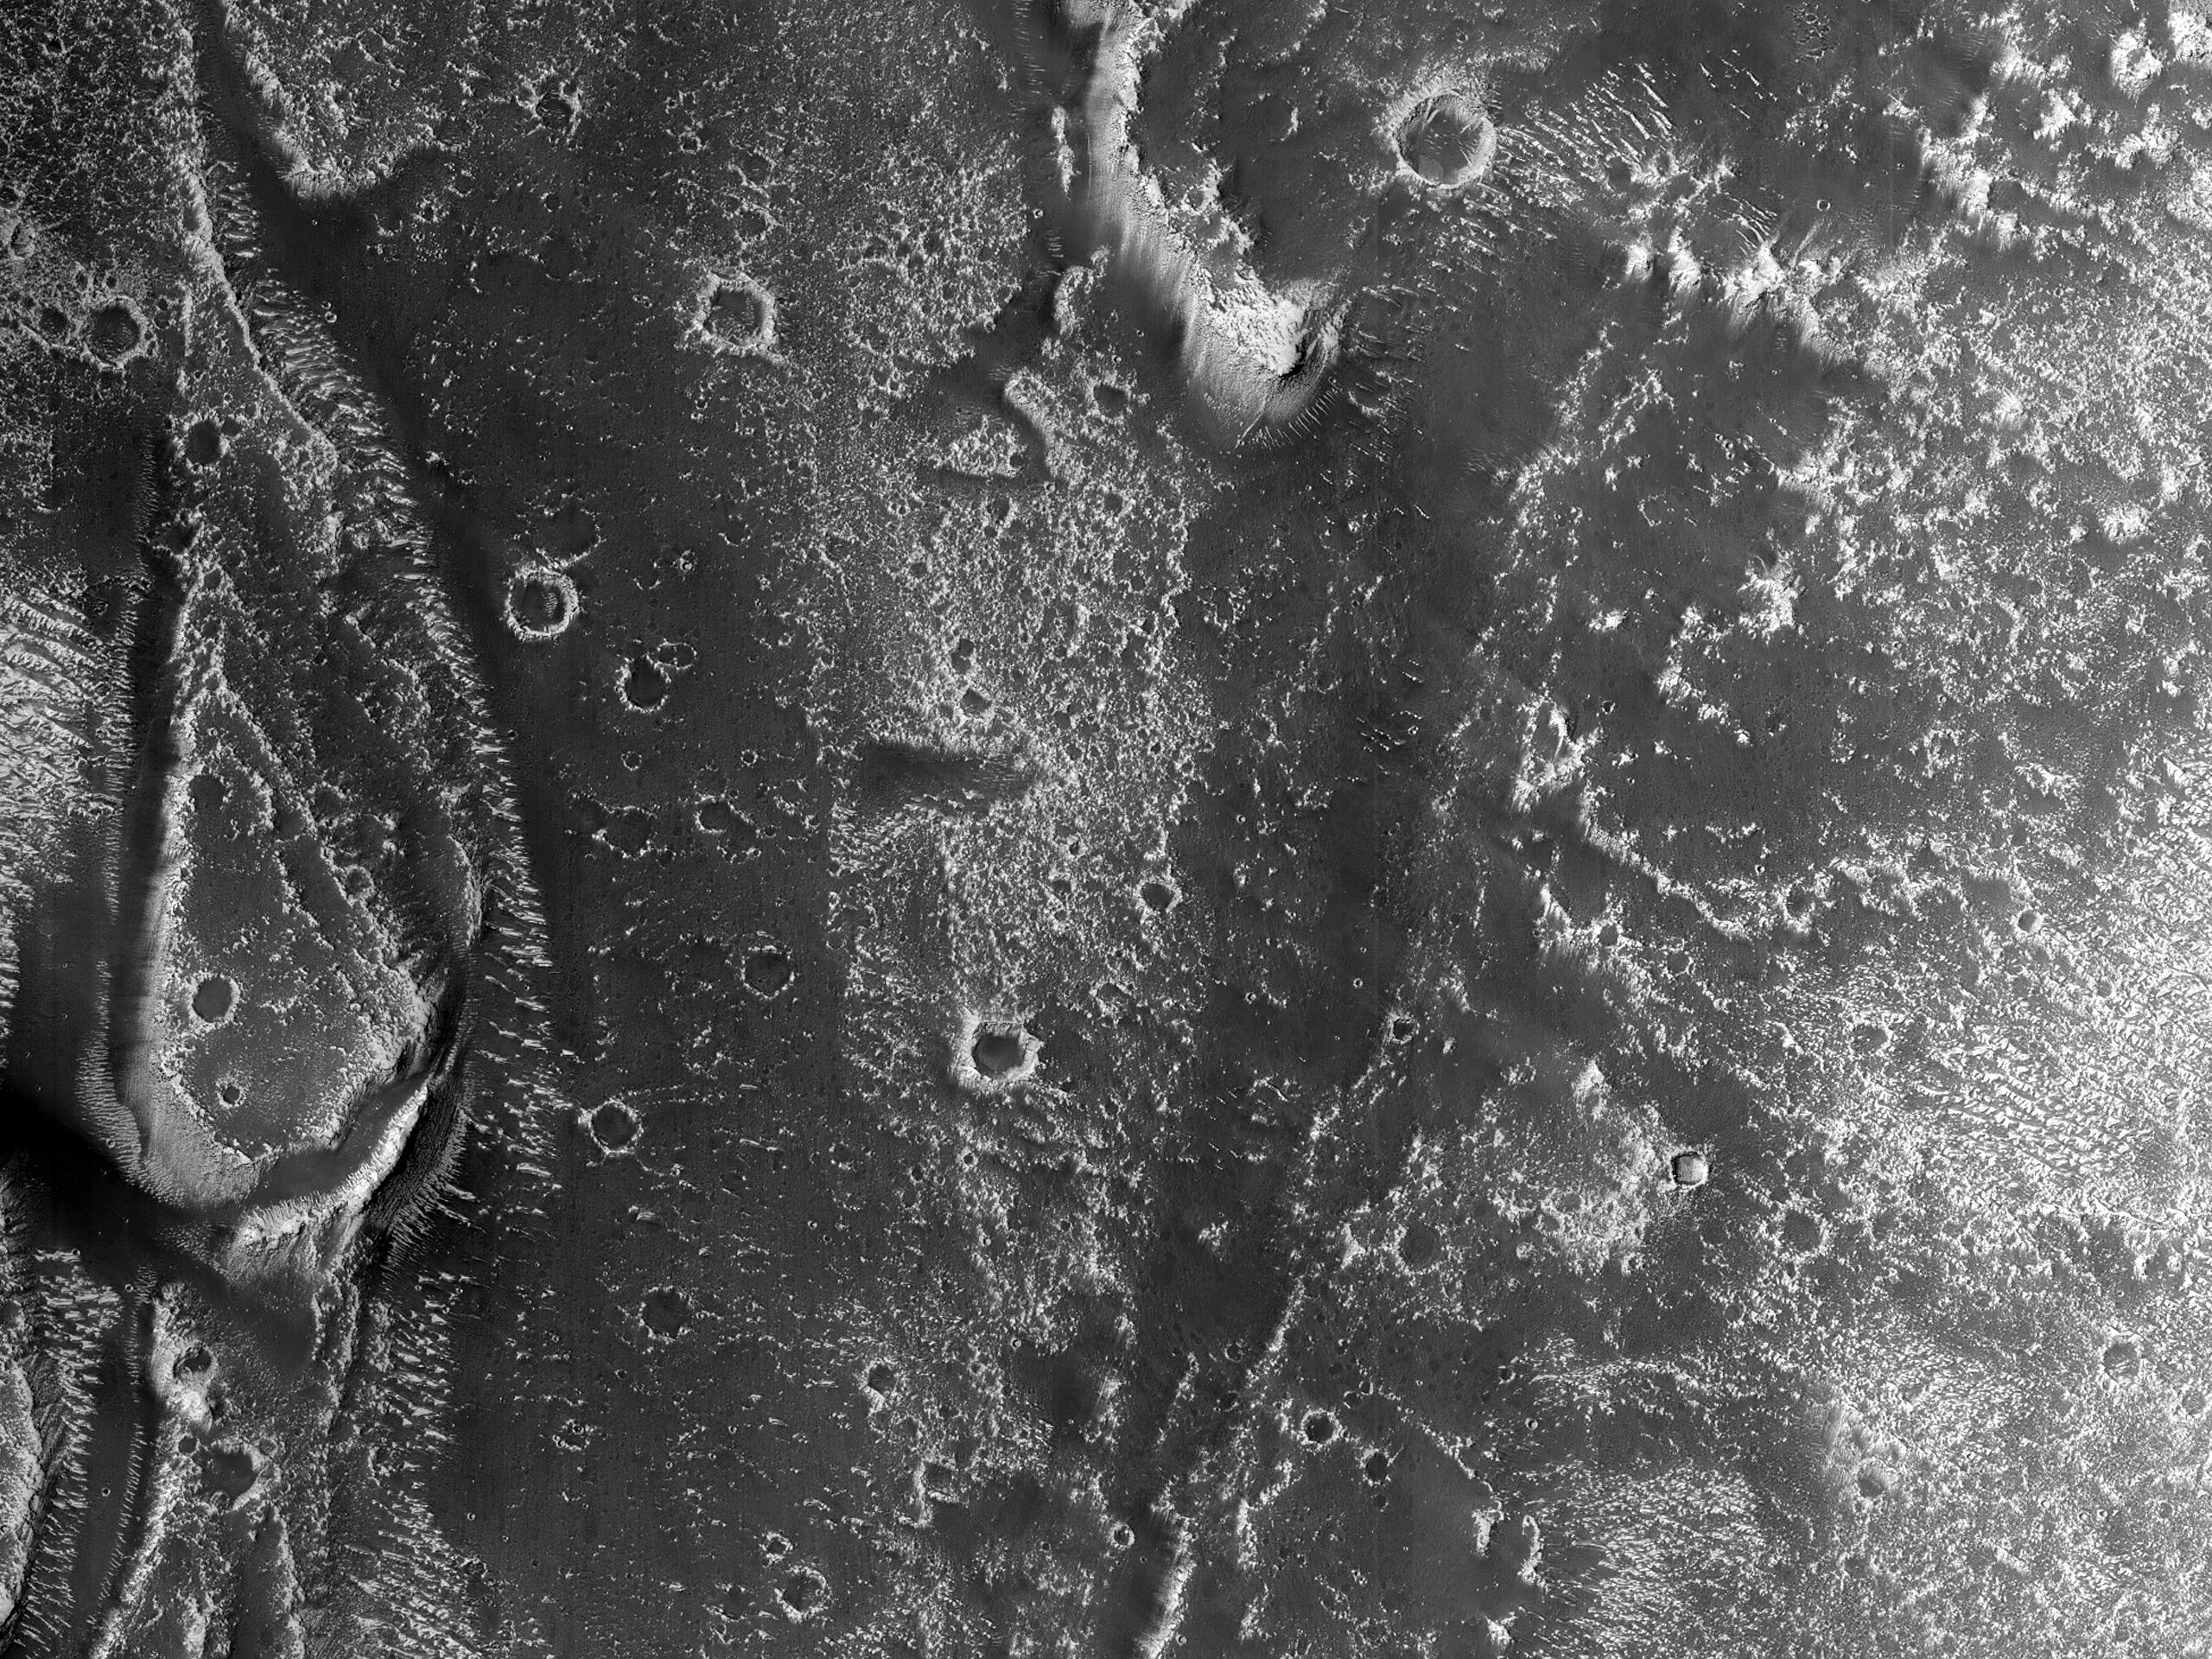 Nodweddion Daearegol Main mewn Cangen o Granicus Valles